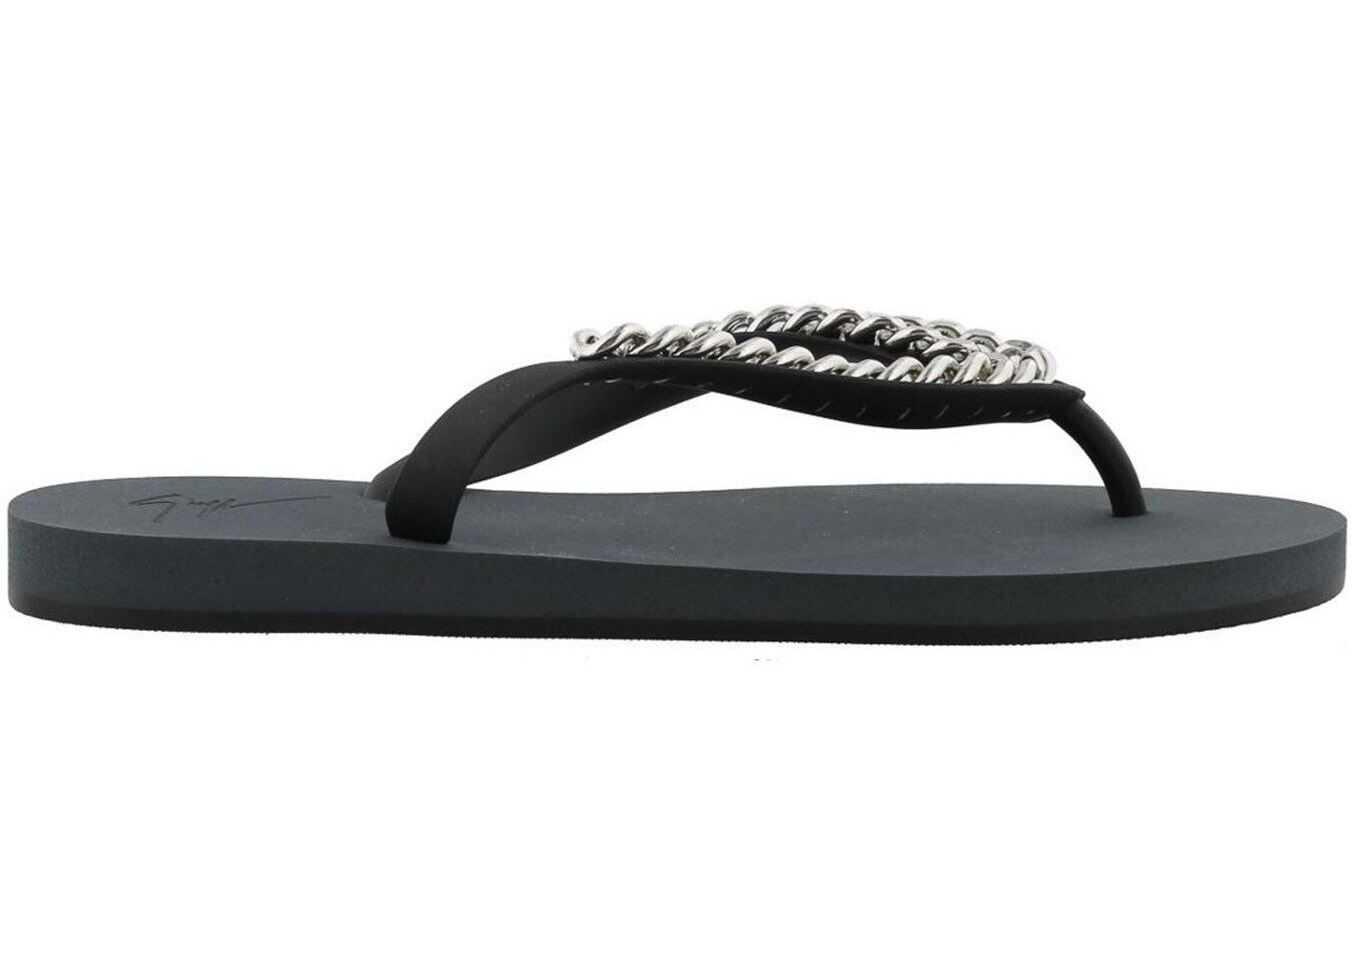 Giuseppe Zanotti Florida Chain Detail Flip Flops Black